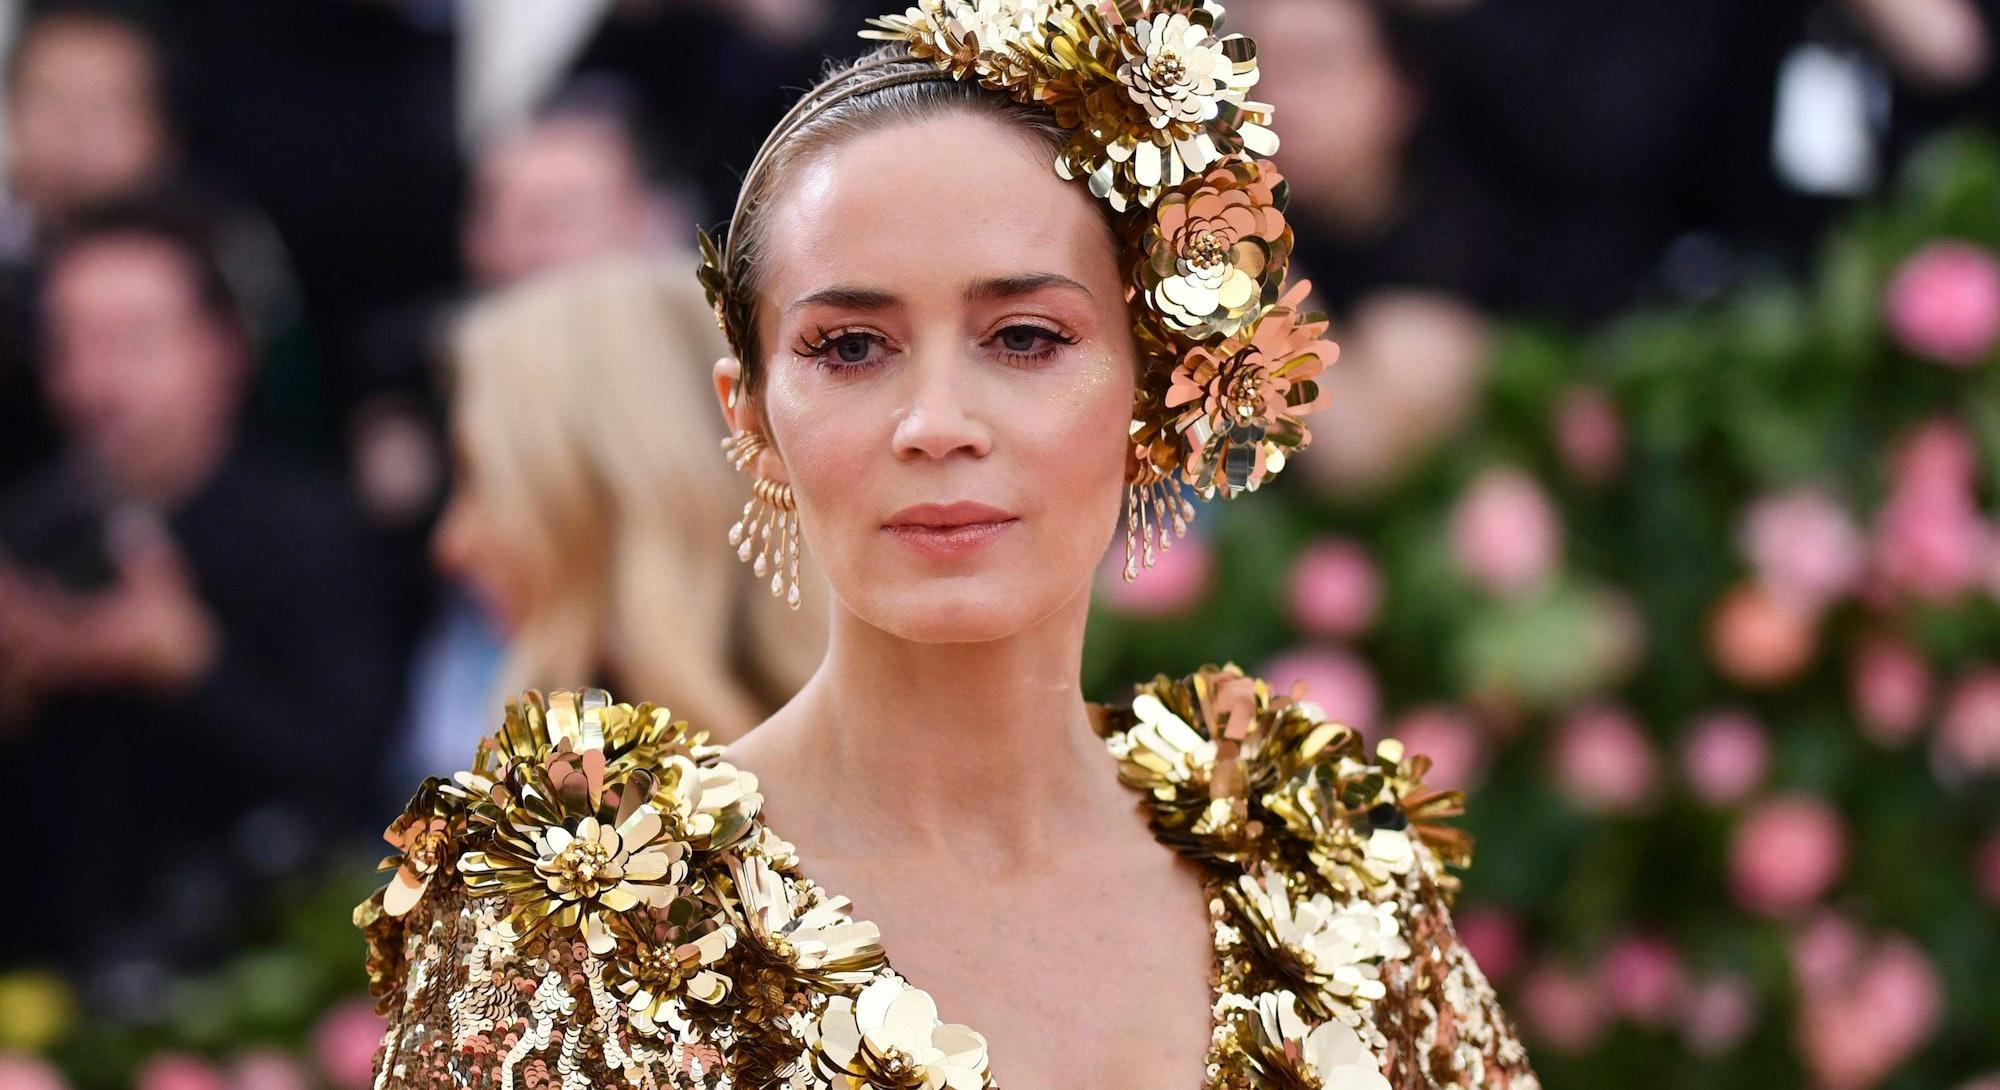 Emily Blunt attends The Metropolitan Museum of Art's Costume Institute benefit gala in 2019.